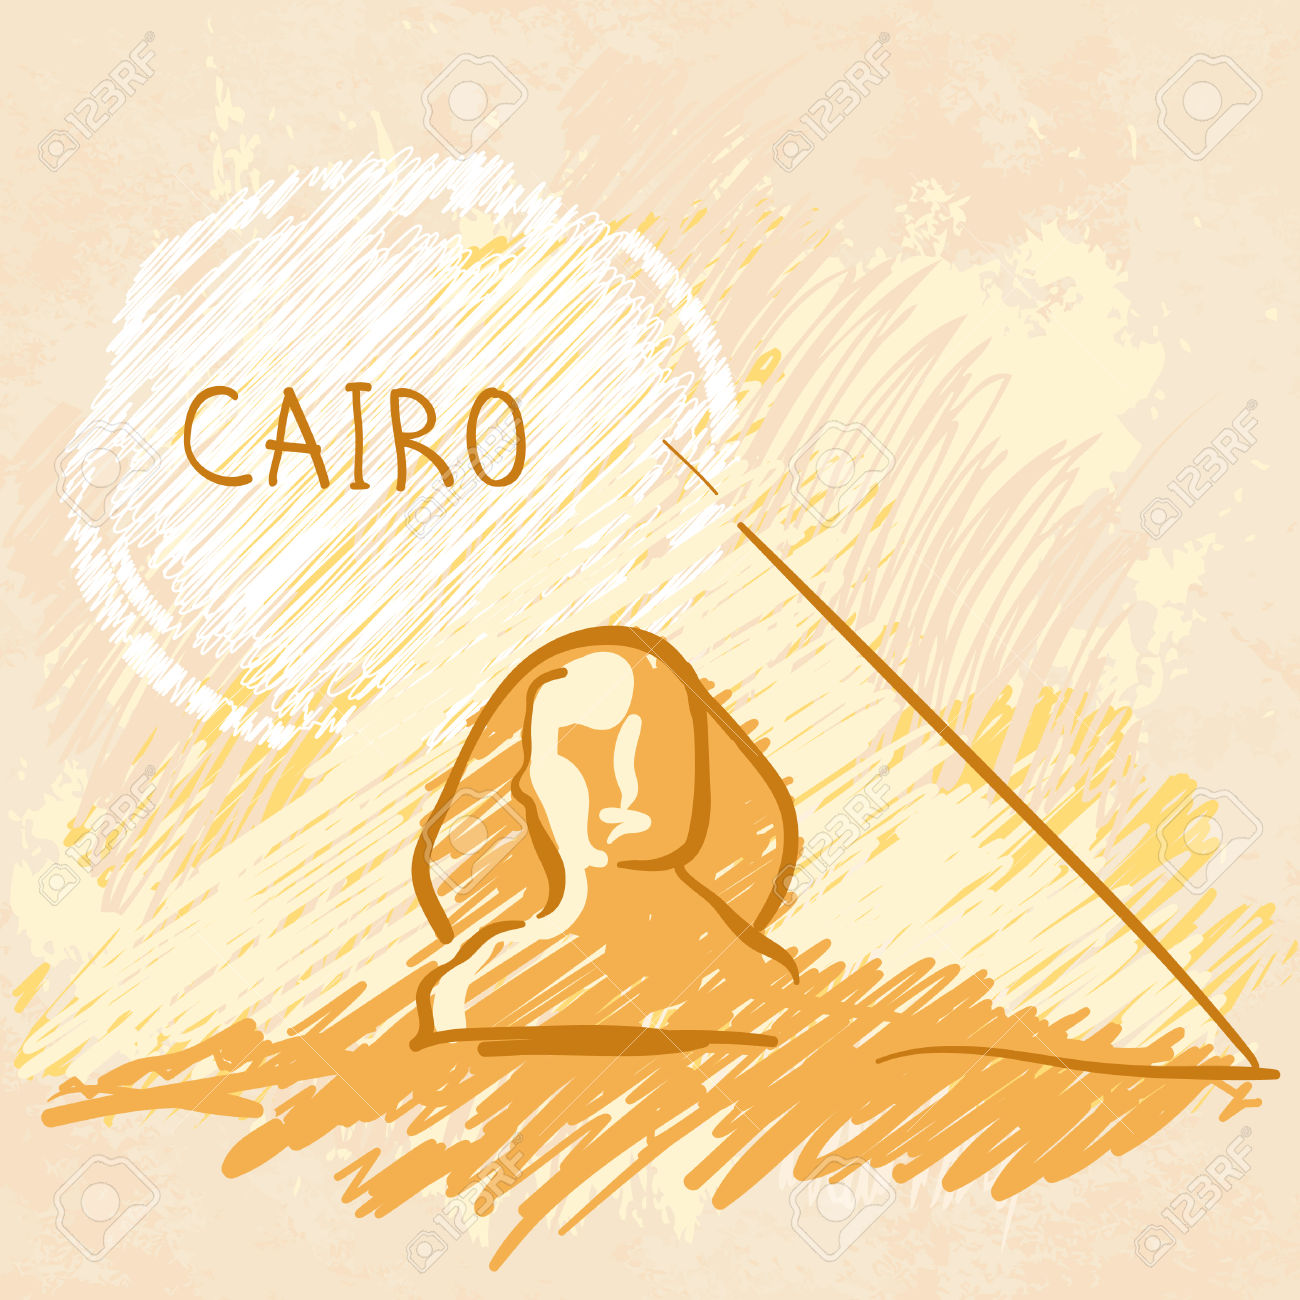 World Famous Landmark Series: Pyramids And Sphinx, Cairo, Egypt.